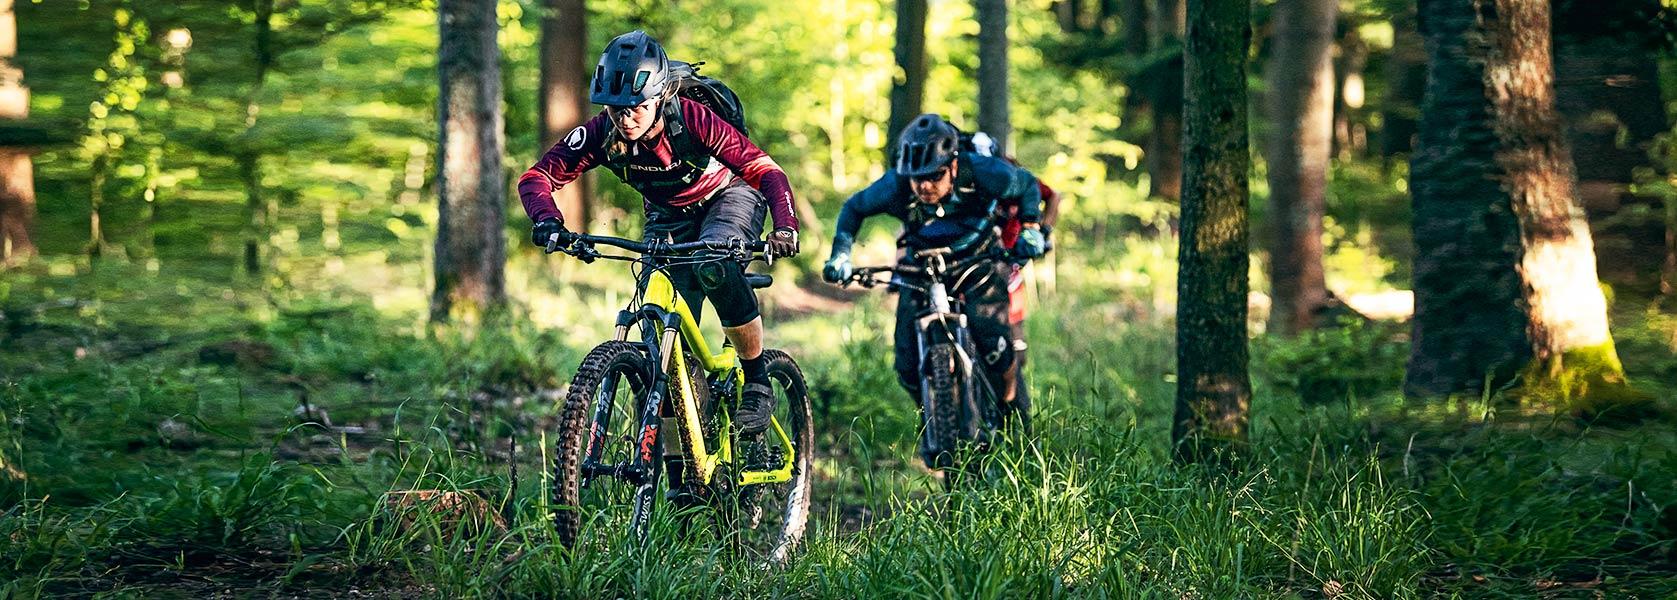 E-Bikes auf dem Trail im Wald